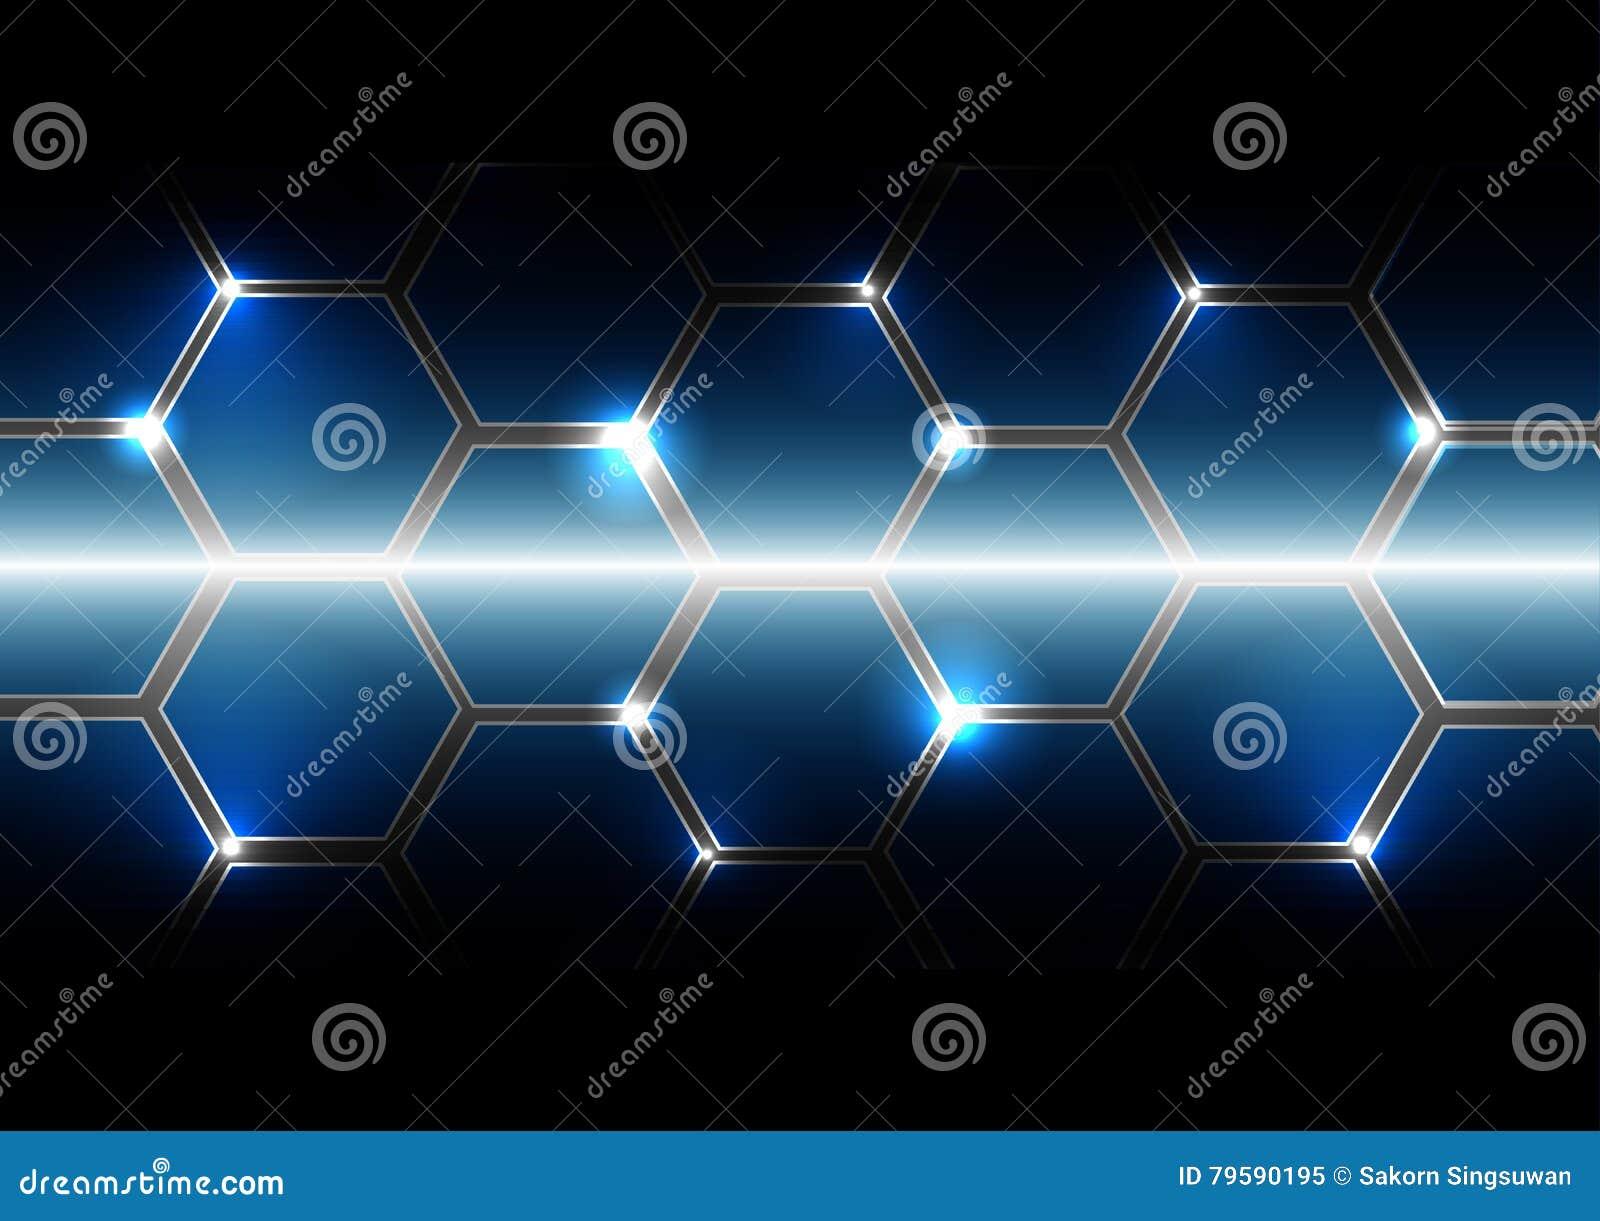 vector pattern hexagon with light background hexagon shape stock